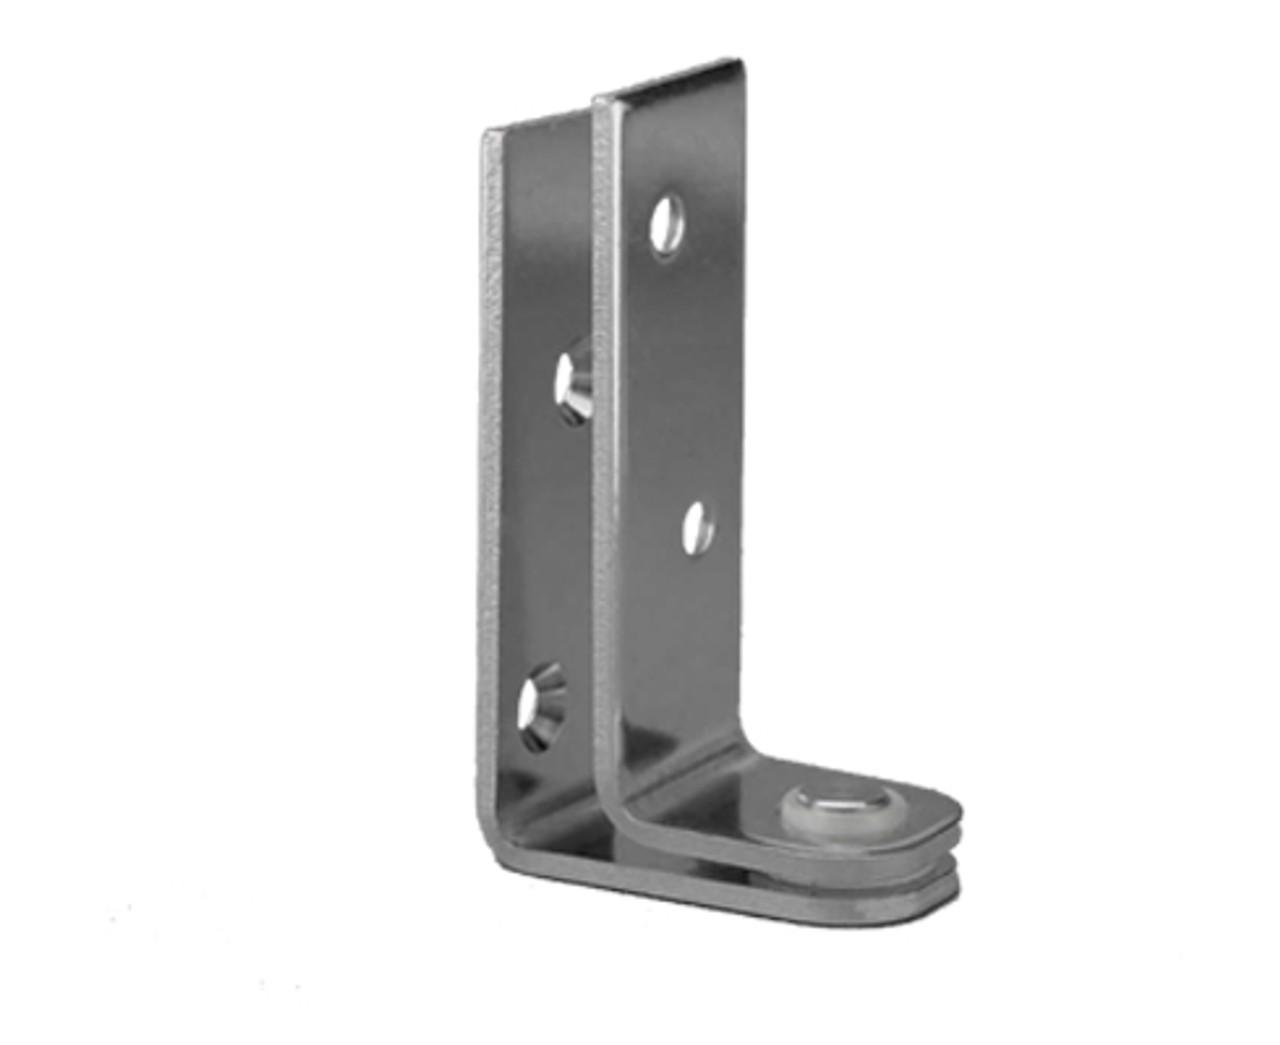 Kason-7305-Stainless-Steel-Pivot-Hinge-67305000076